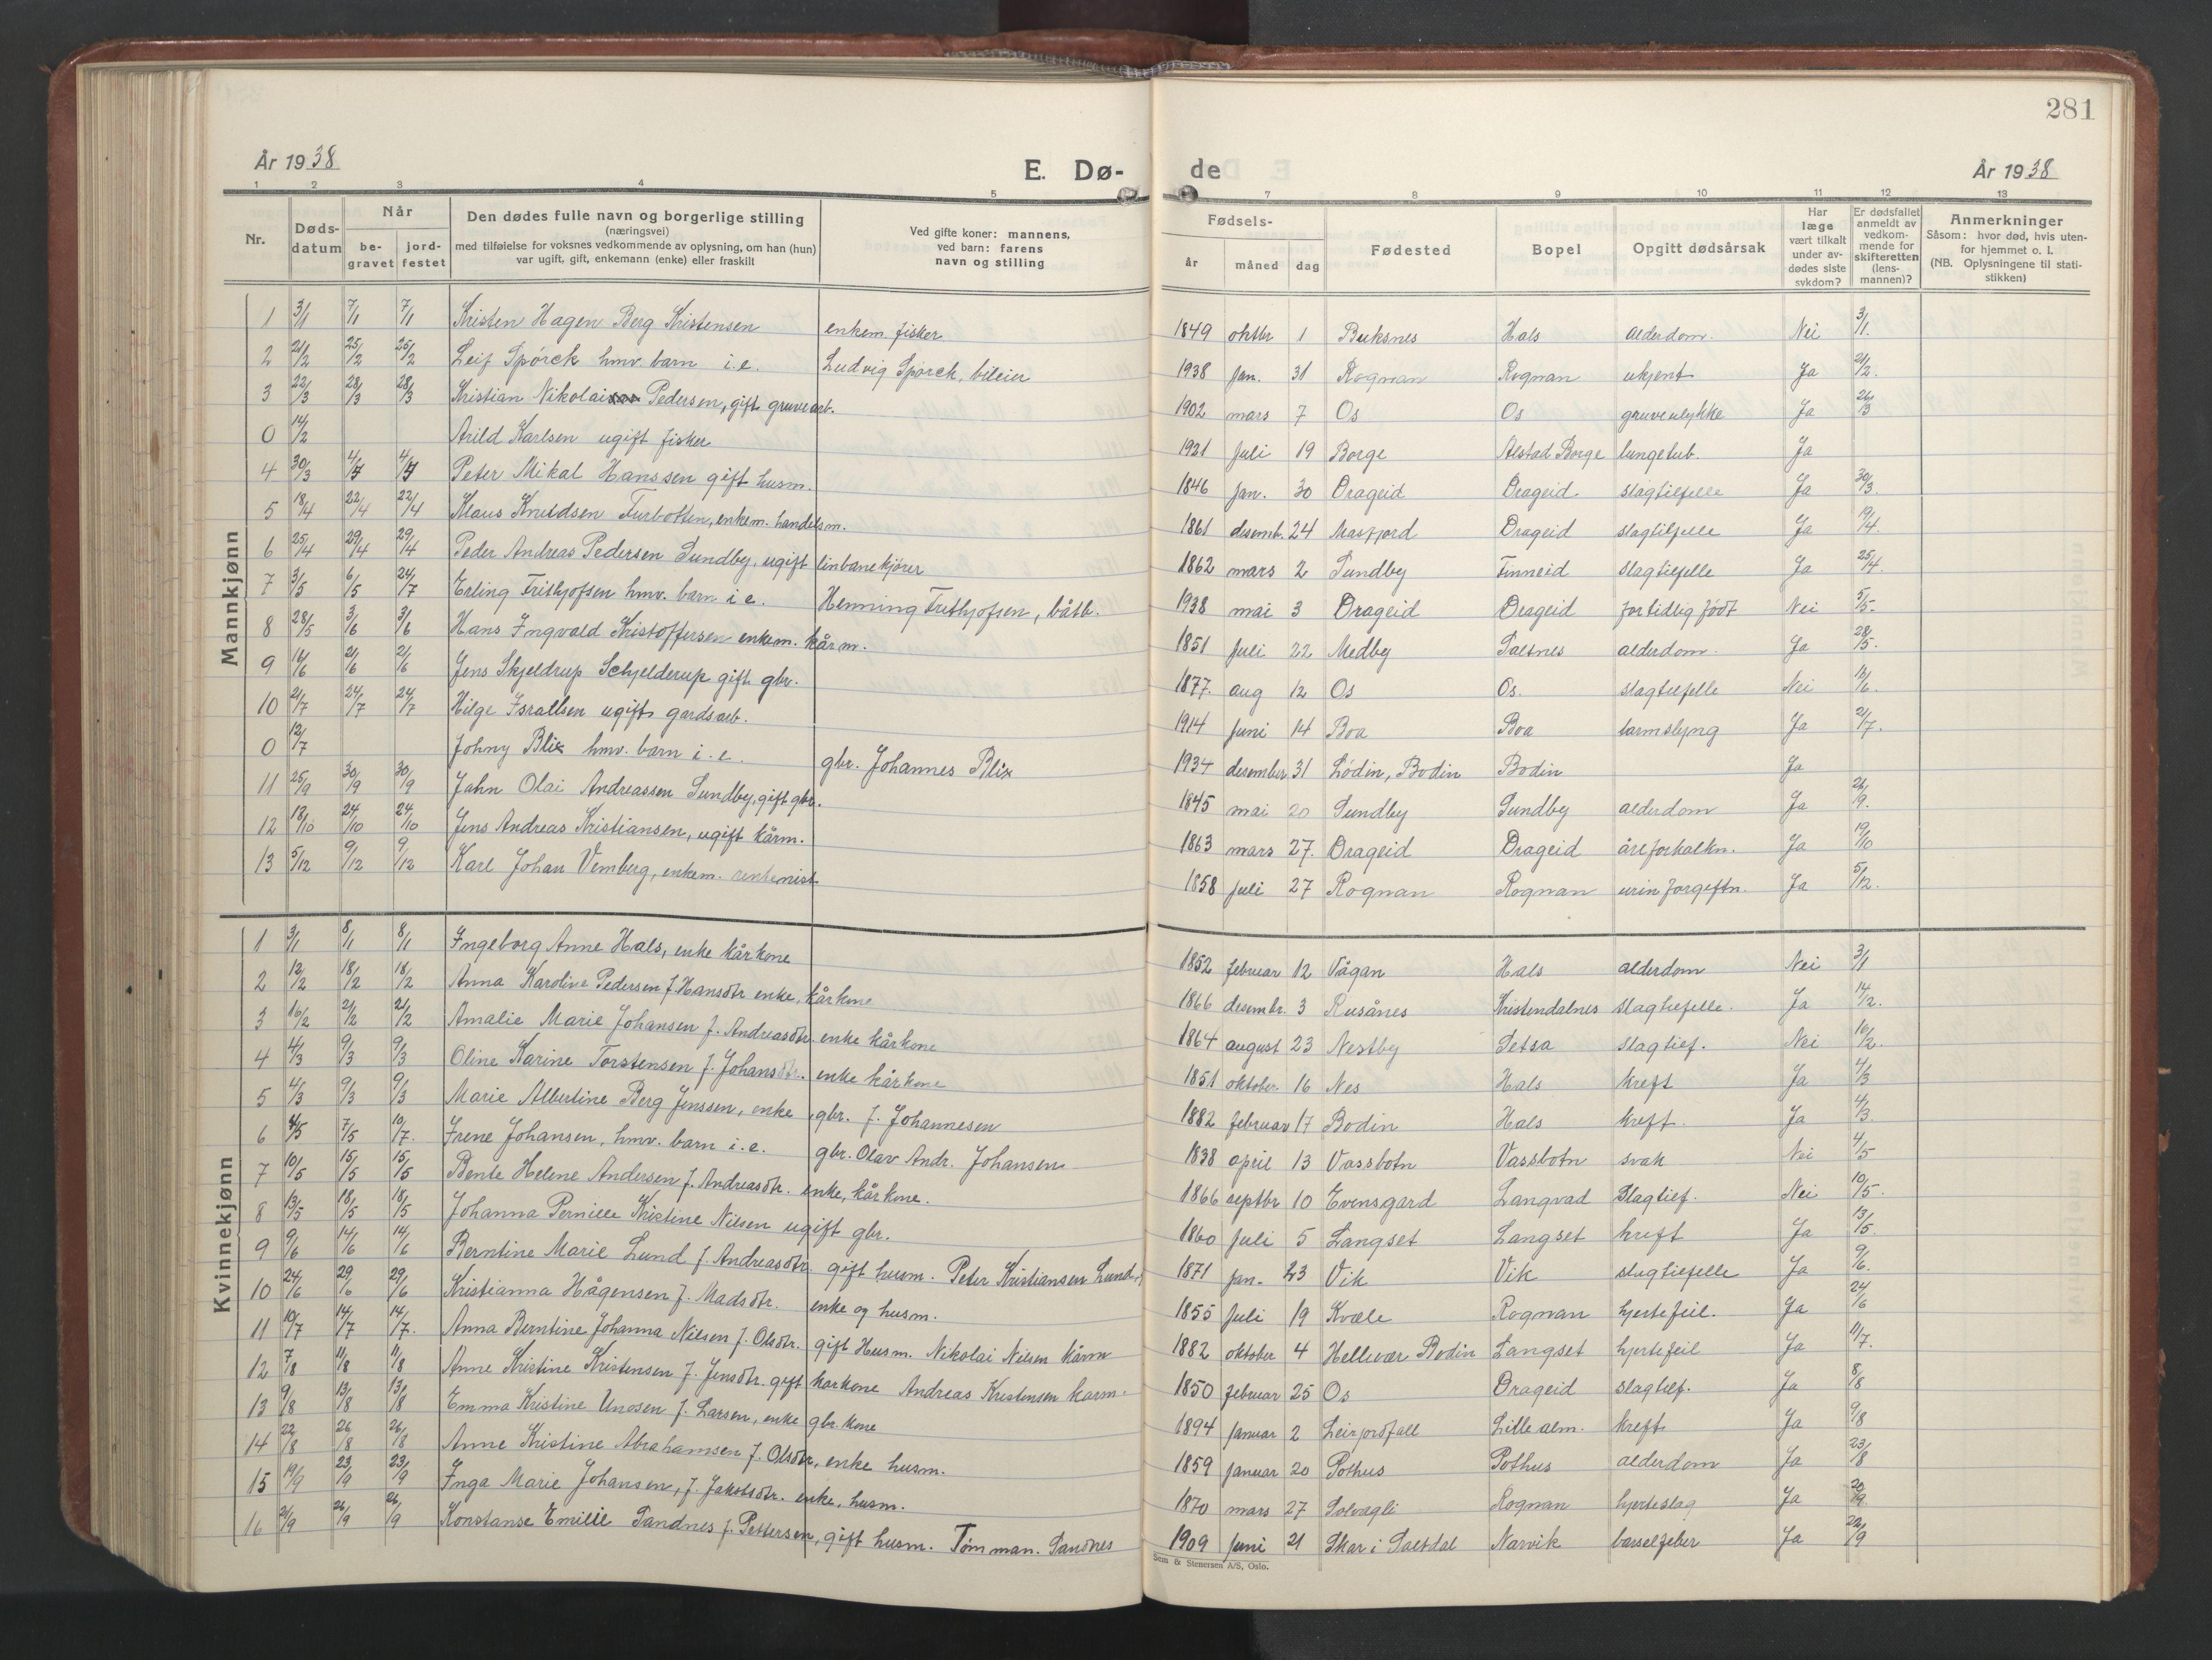 SAT, Ministerialprotokoller, klokkerbøker og fødselsregistre - Nordland, 847/L0680: Klokkerbok nr. 847C08, 1930-1947, s. 281